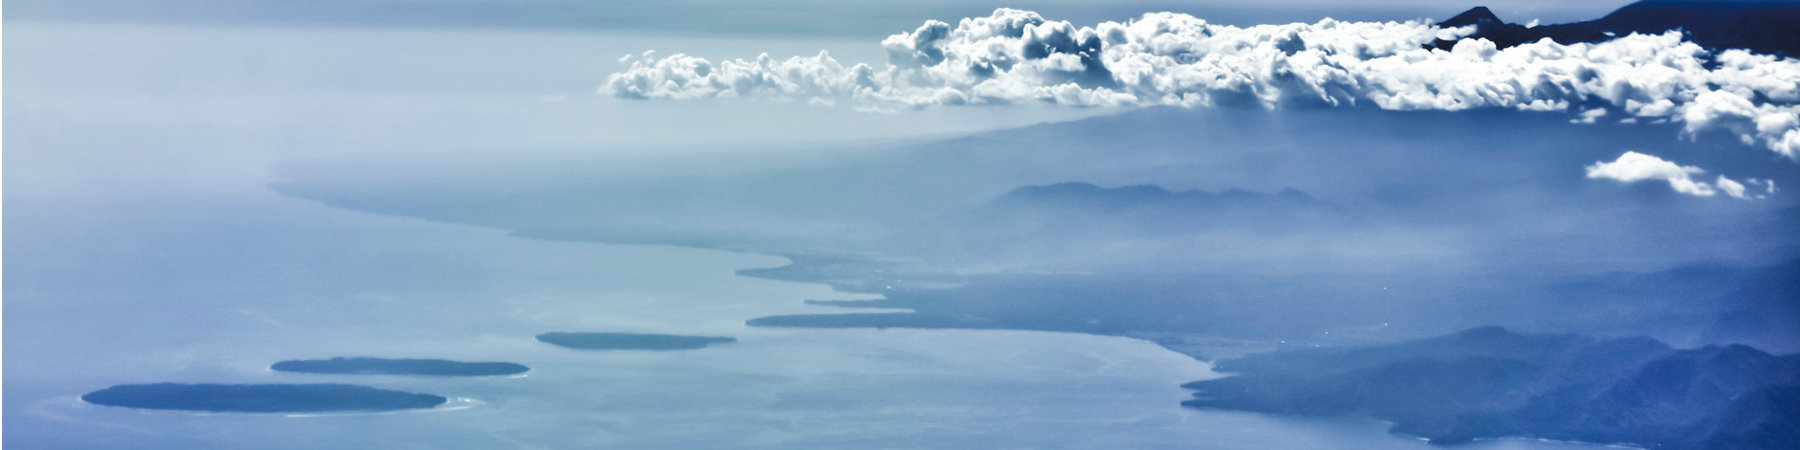 Lombok_gili_luchtfoto_ORG